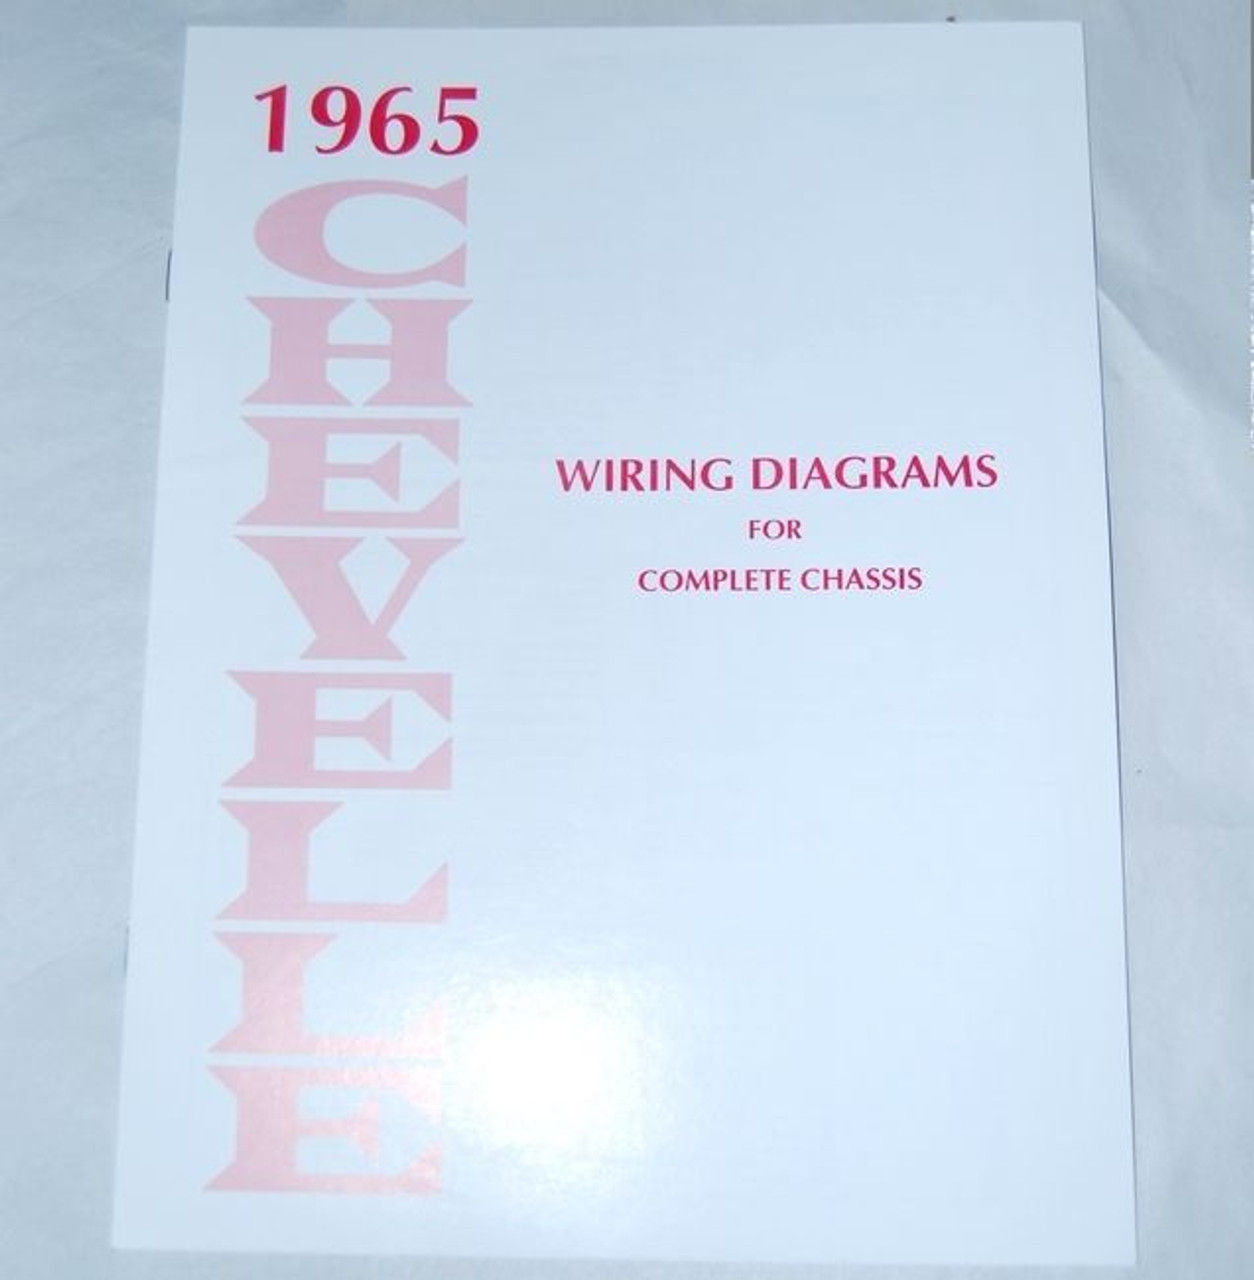 L1802_zpshcfh4k1r__61604.1443648966?c=2 1964 el camino wiring diagram 1970 el camino wiring diagram, 1972 1968 el camino wiring diagram at soozxer.org